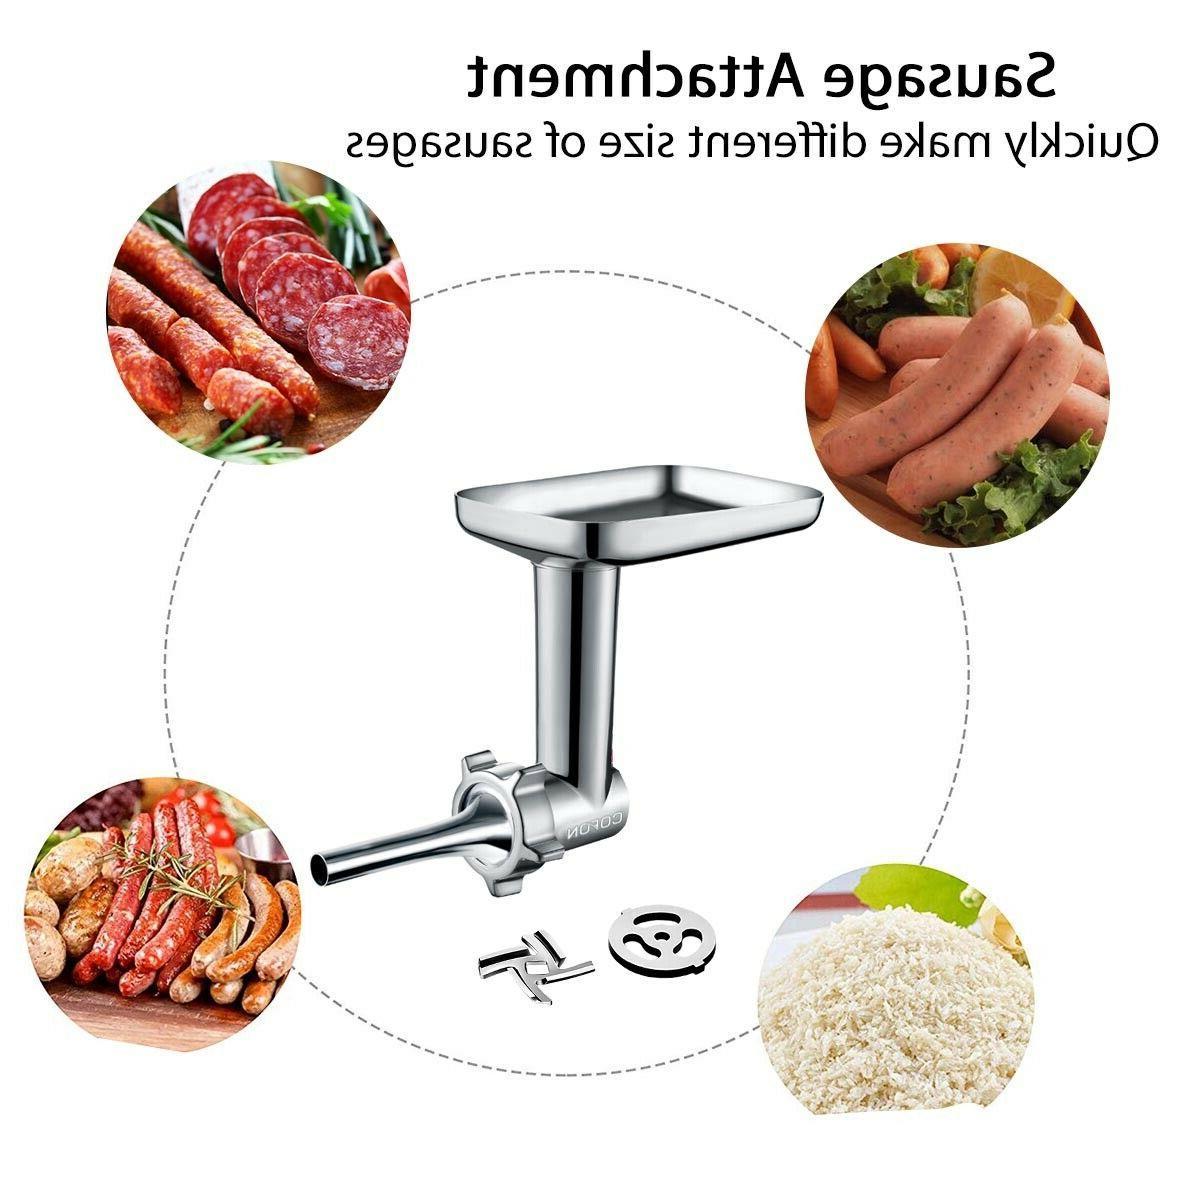 For Kitchenaid Accessories Pro Grinder Attachment